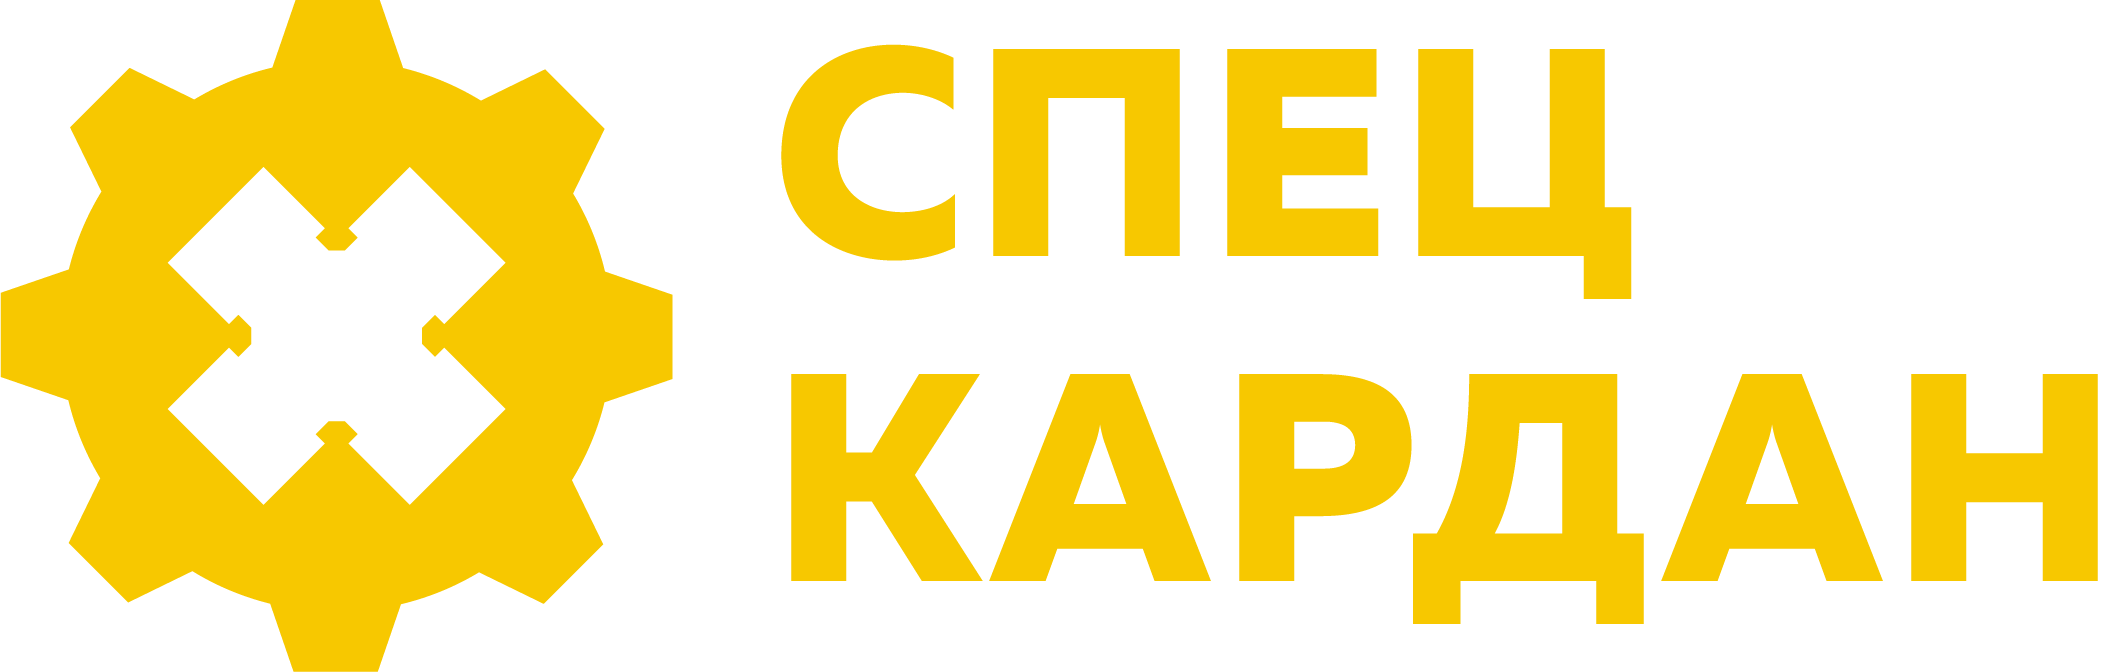 Спец Кардан